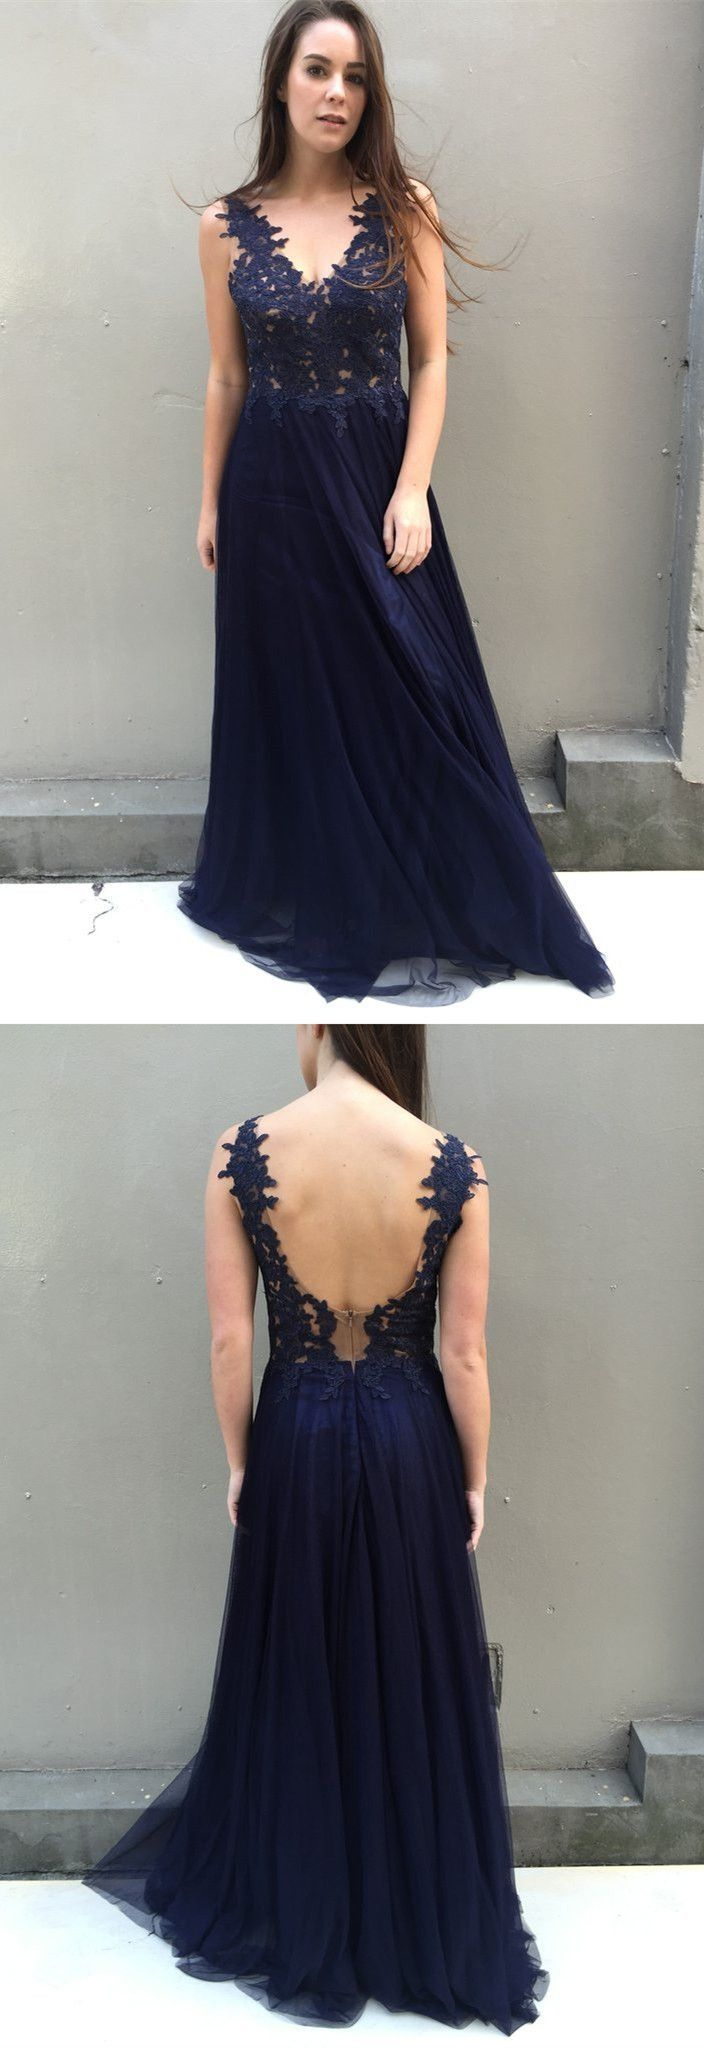 Custom made trendy prom dresses long prom dresses navy prom